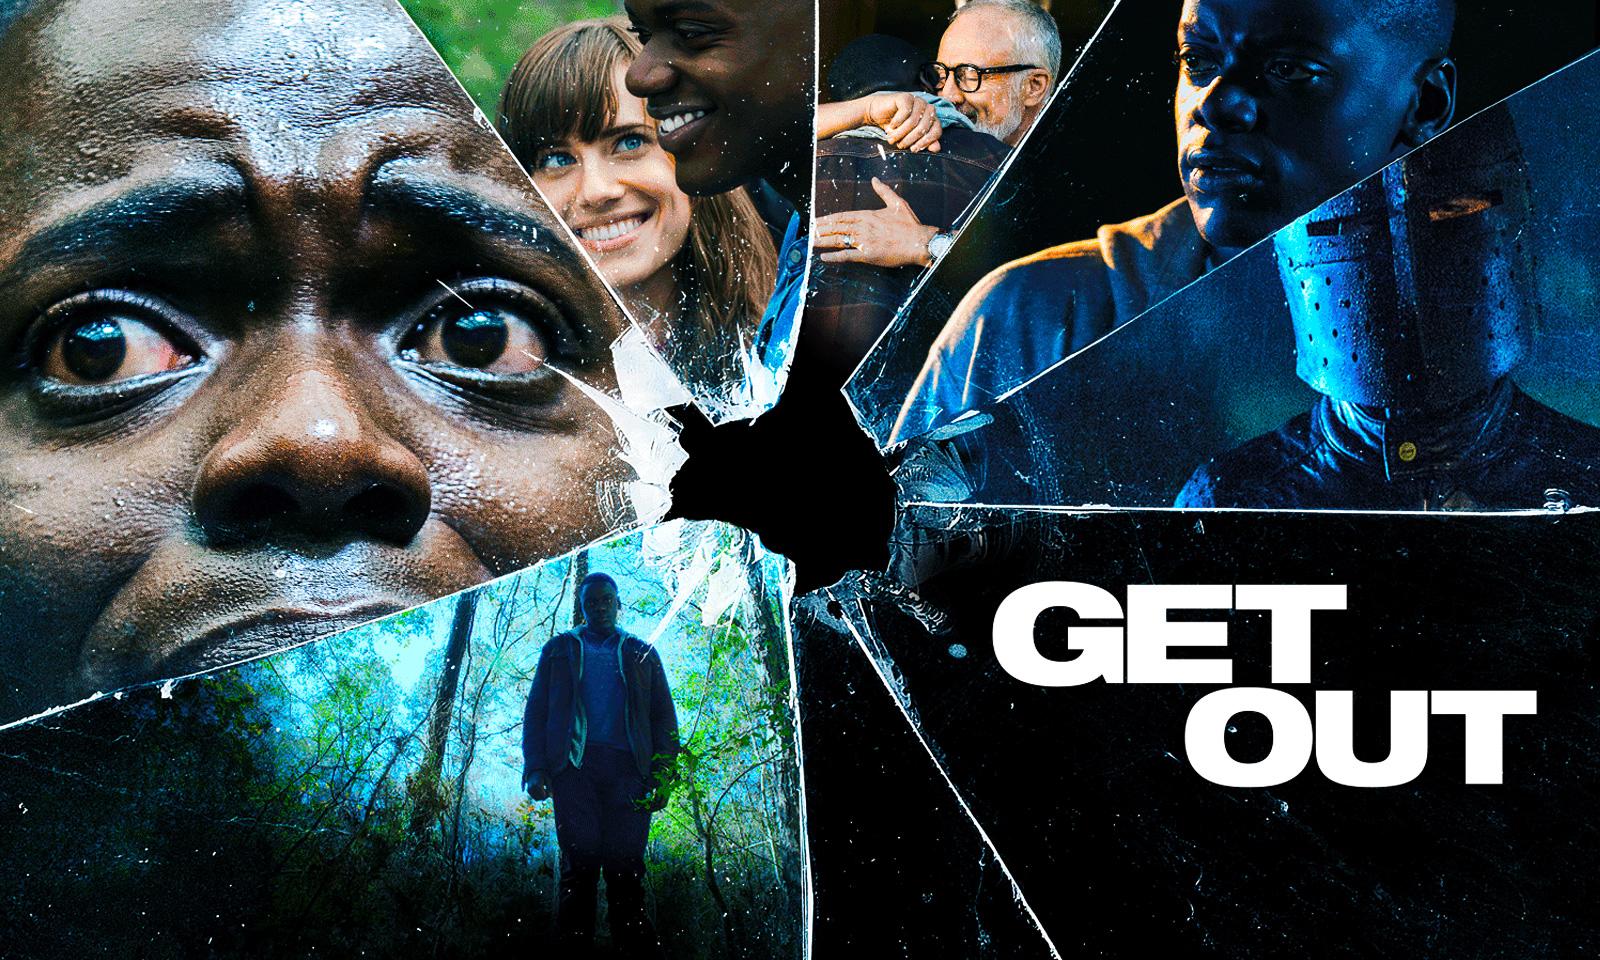 Get out, Zbeži!, Jordan Peele, Universal Pictures